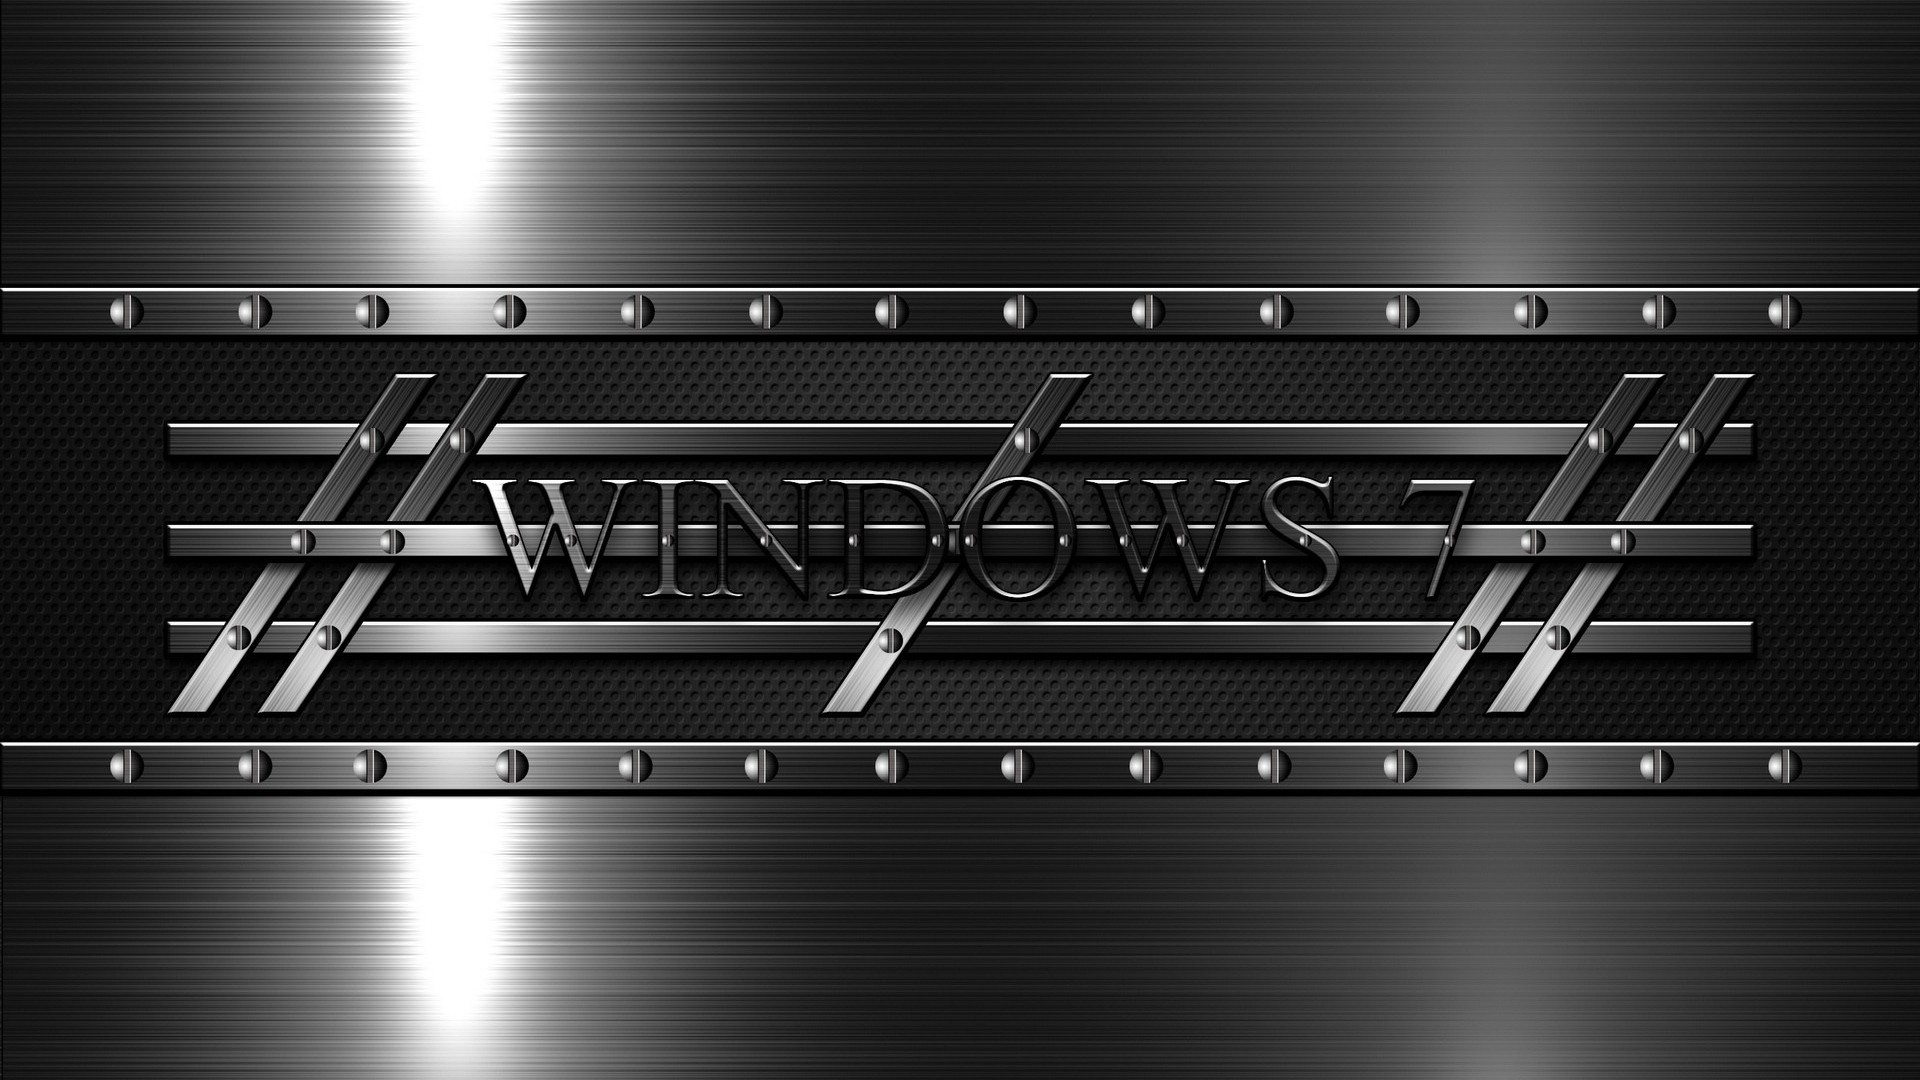 Black Windows Wallpaper 1080p: Black Wallpaper 1080p ·① WallpaperTag